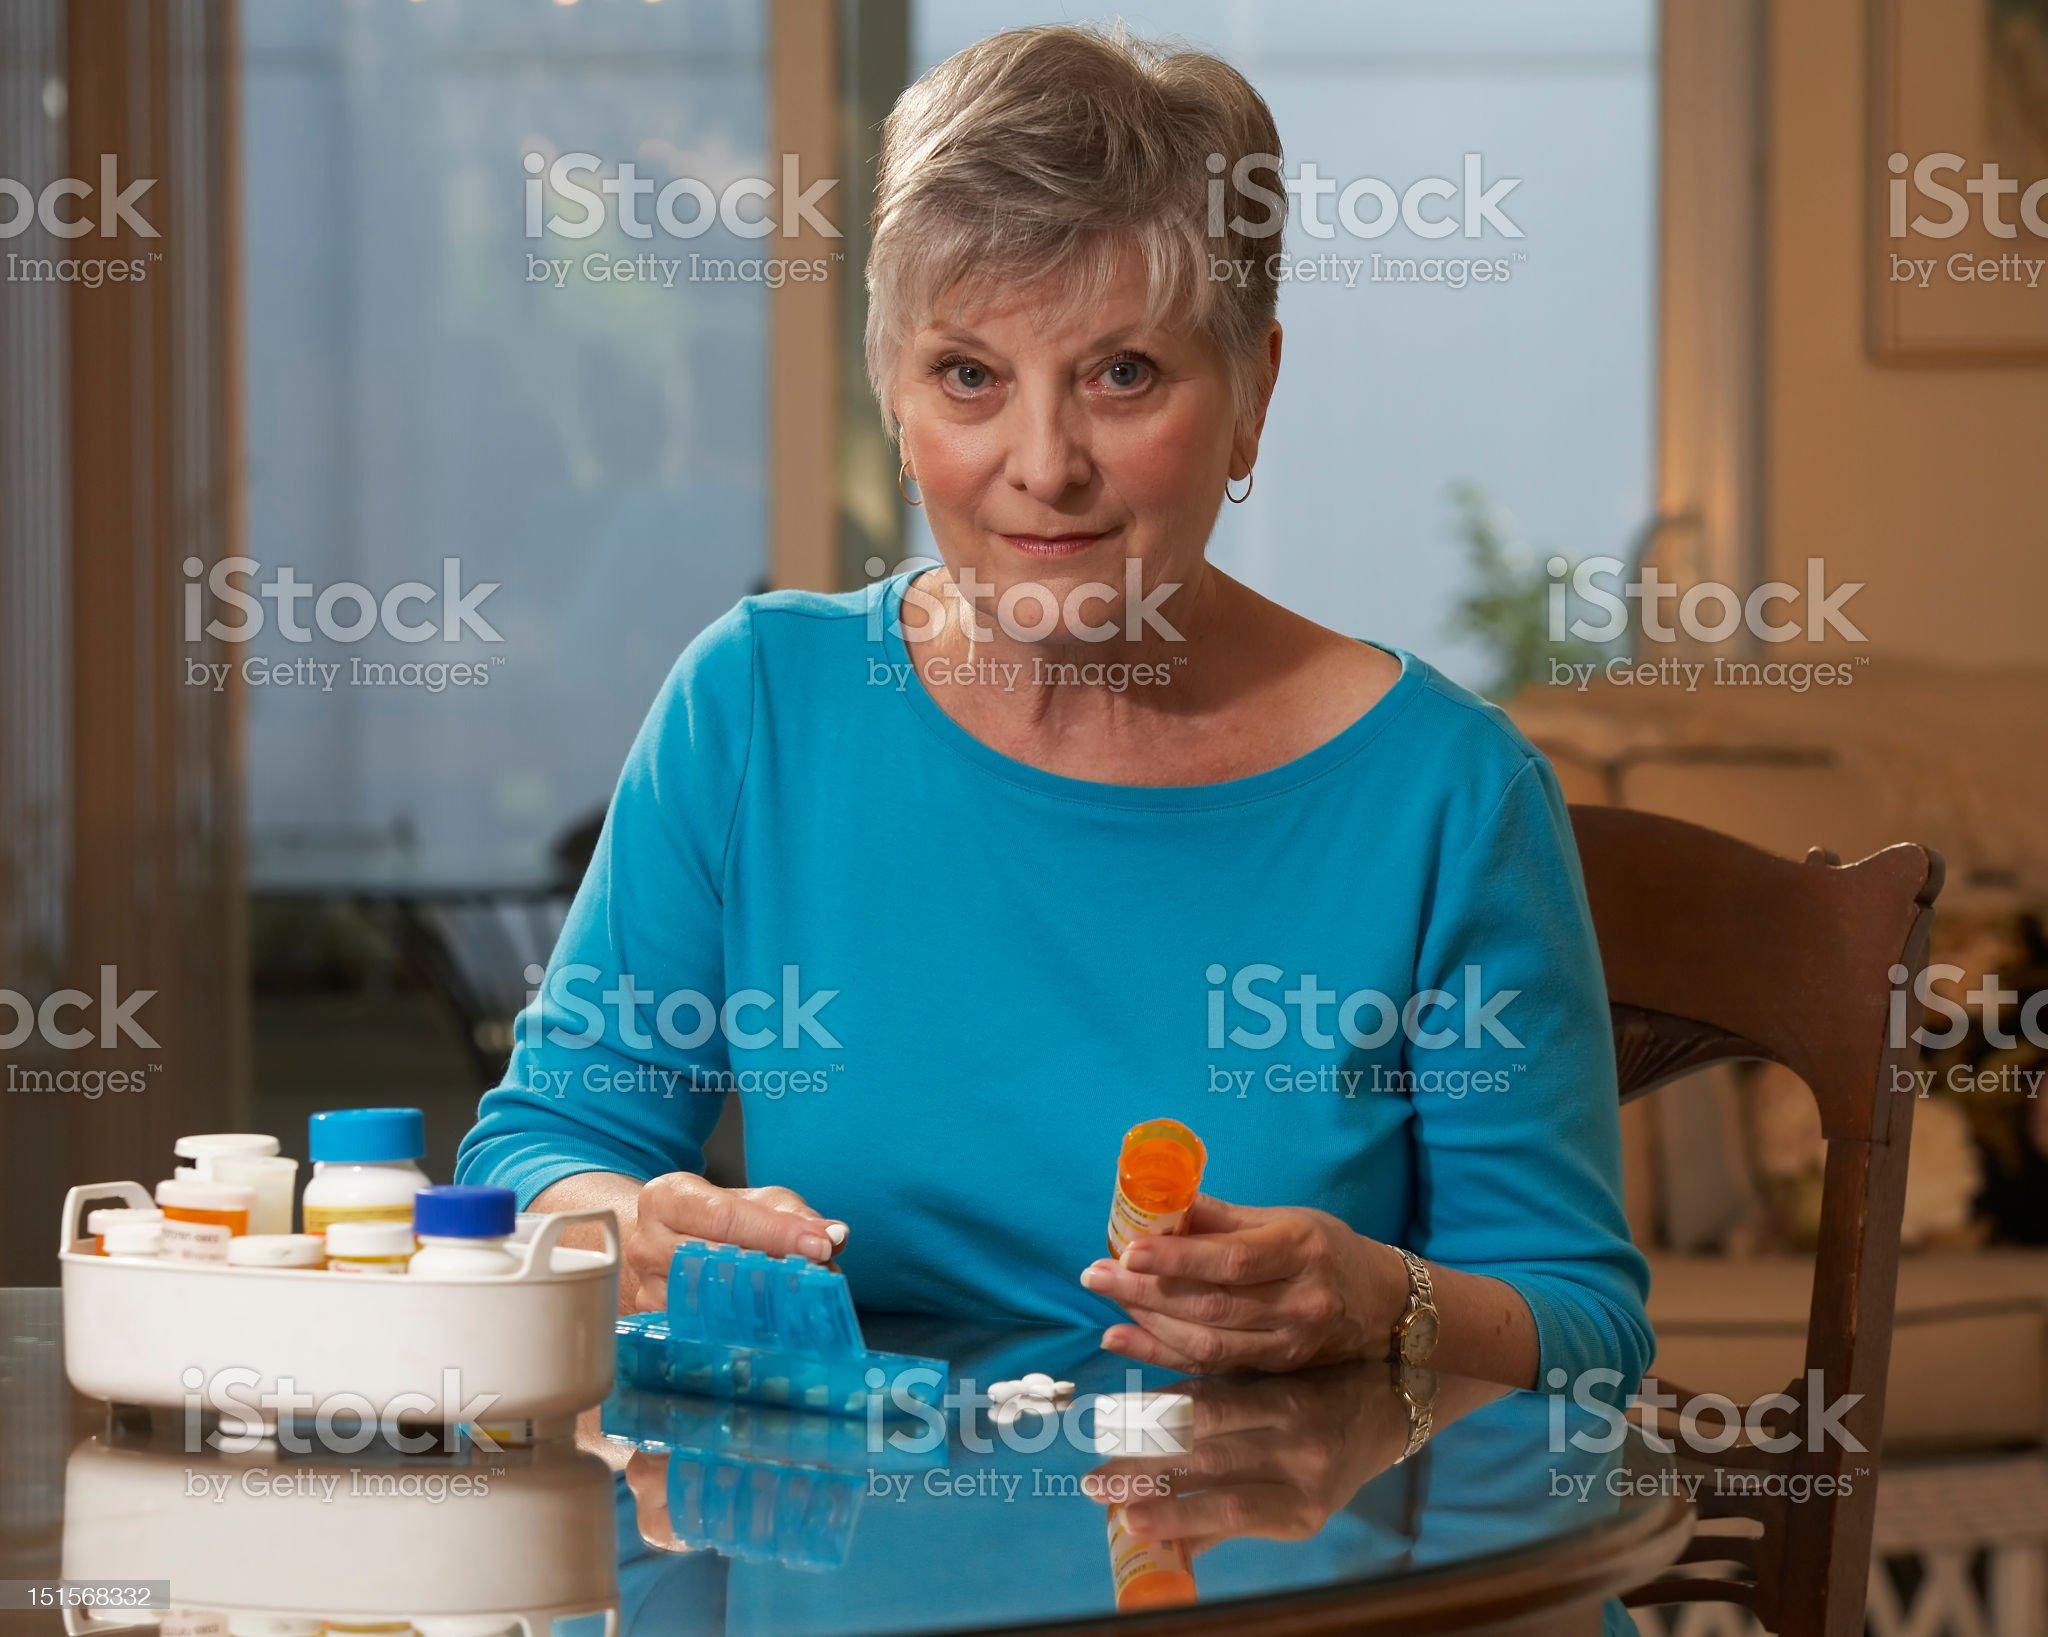 Woman sorting medications royalty-free stock photo